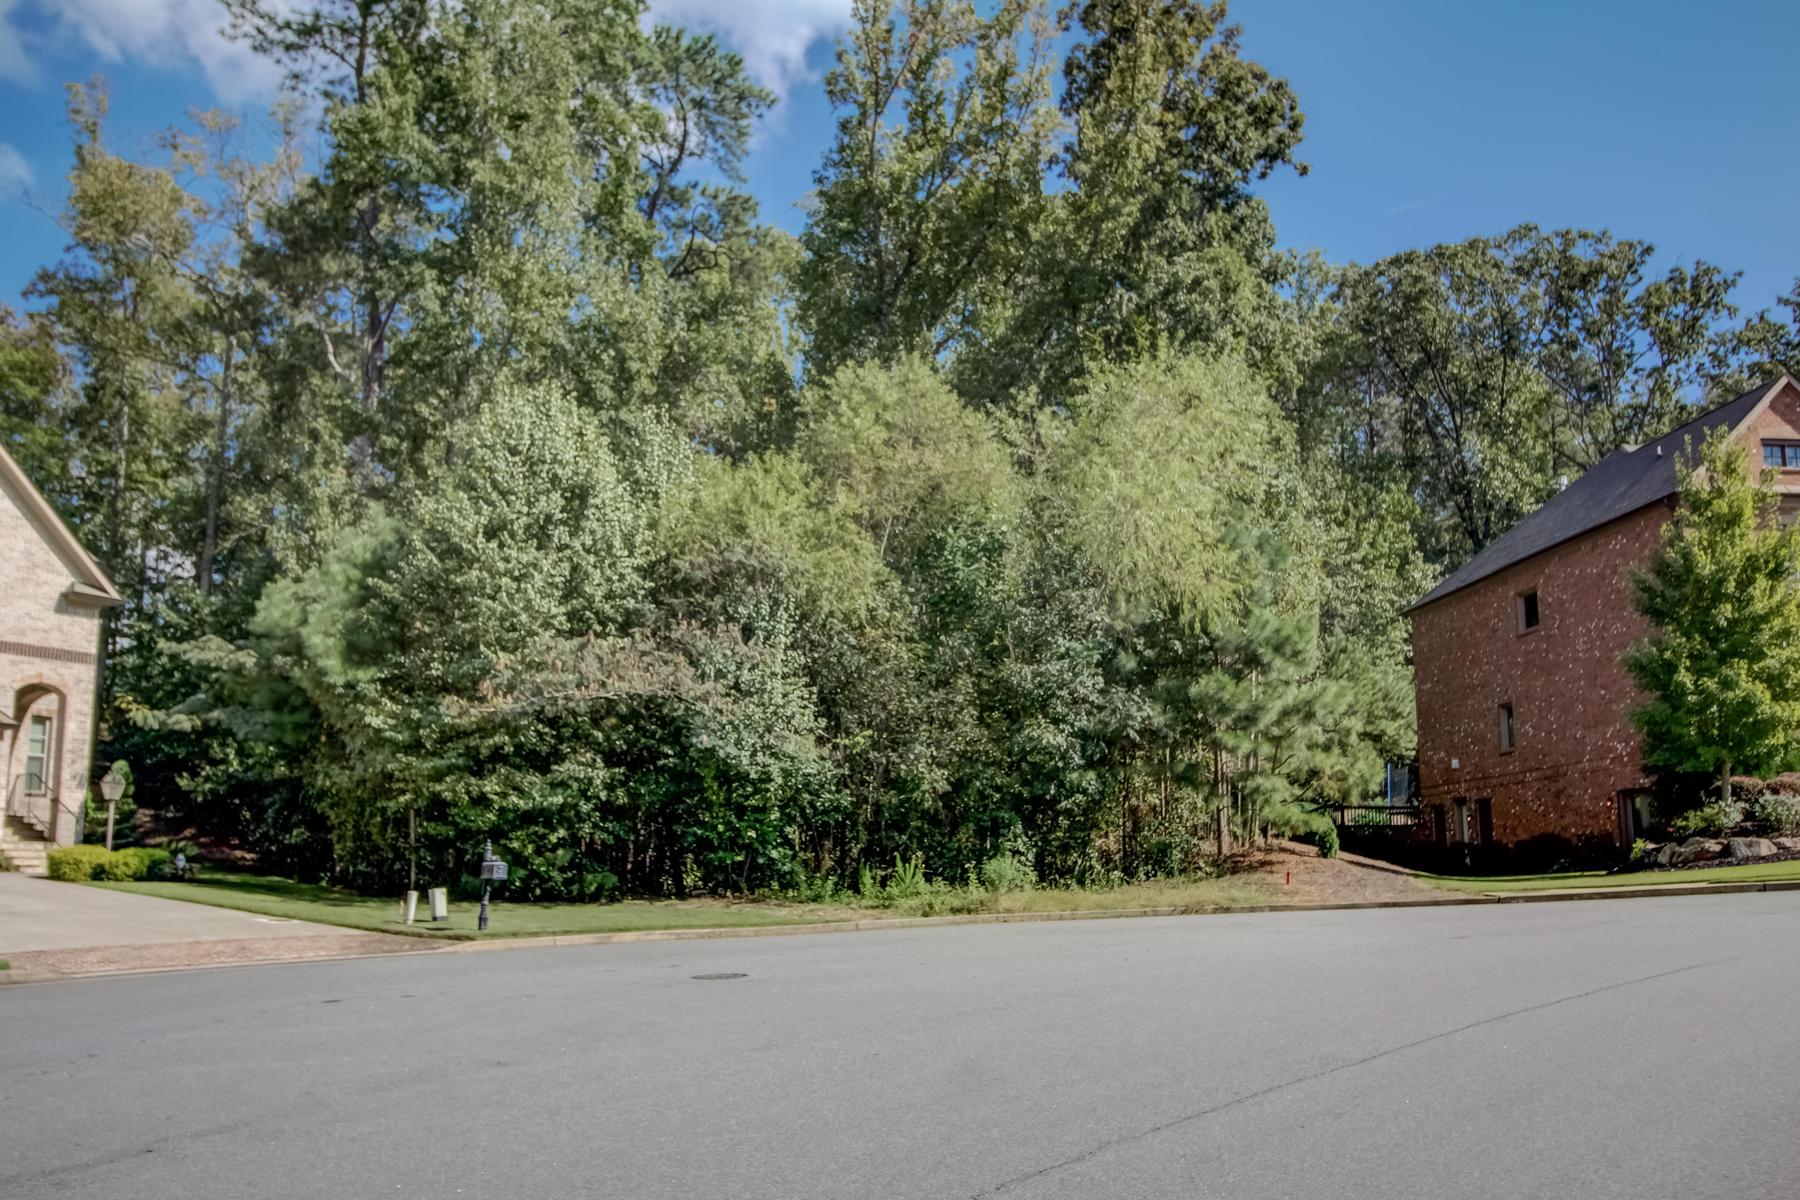 Land for Sale at Exclusive Homesite In Established Gated Community 3350 Camellia Lane Suwanee, Georgia 30024 United States